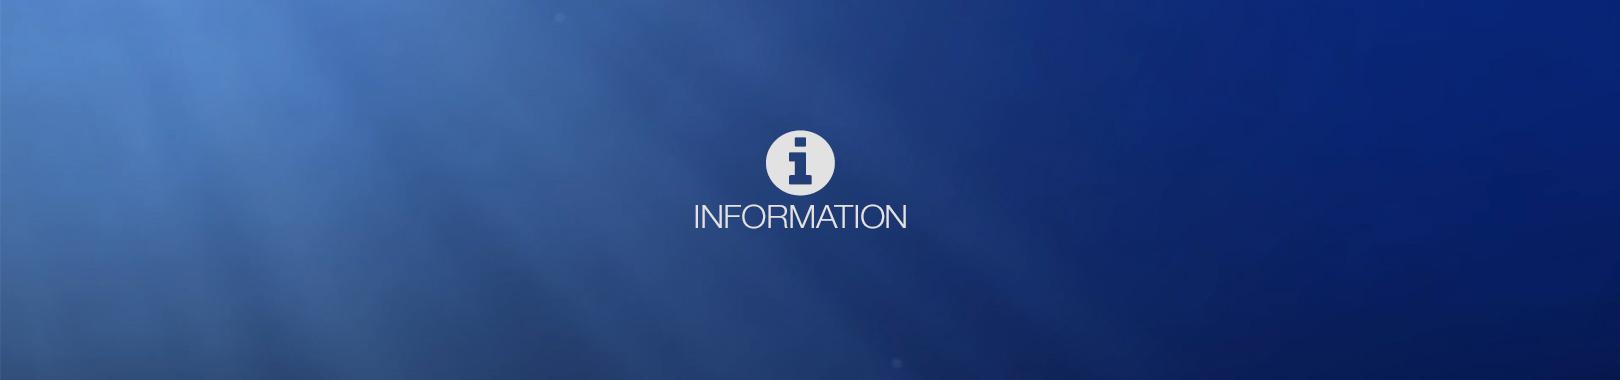 S4 Fair4Music - Information